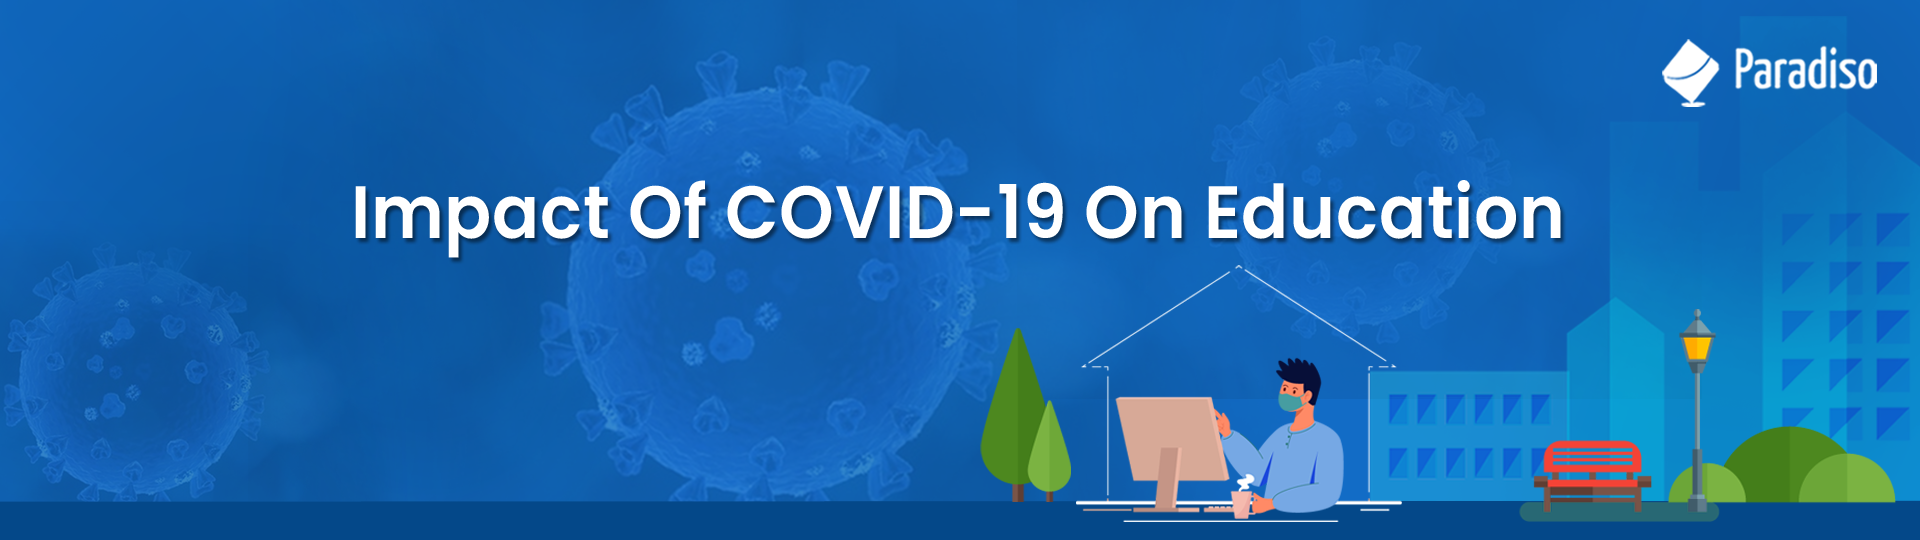 IMPACT Of COVID-19 On Education_Blog